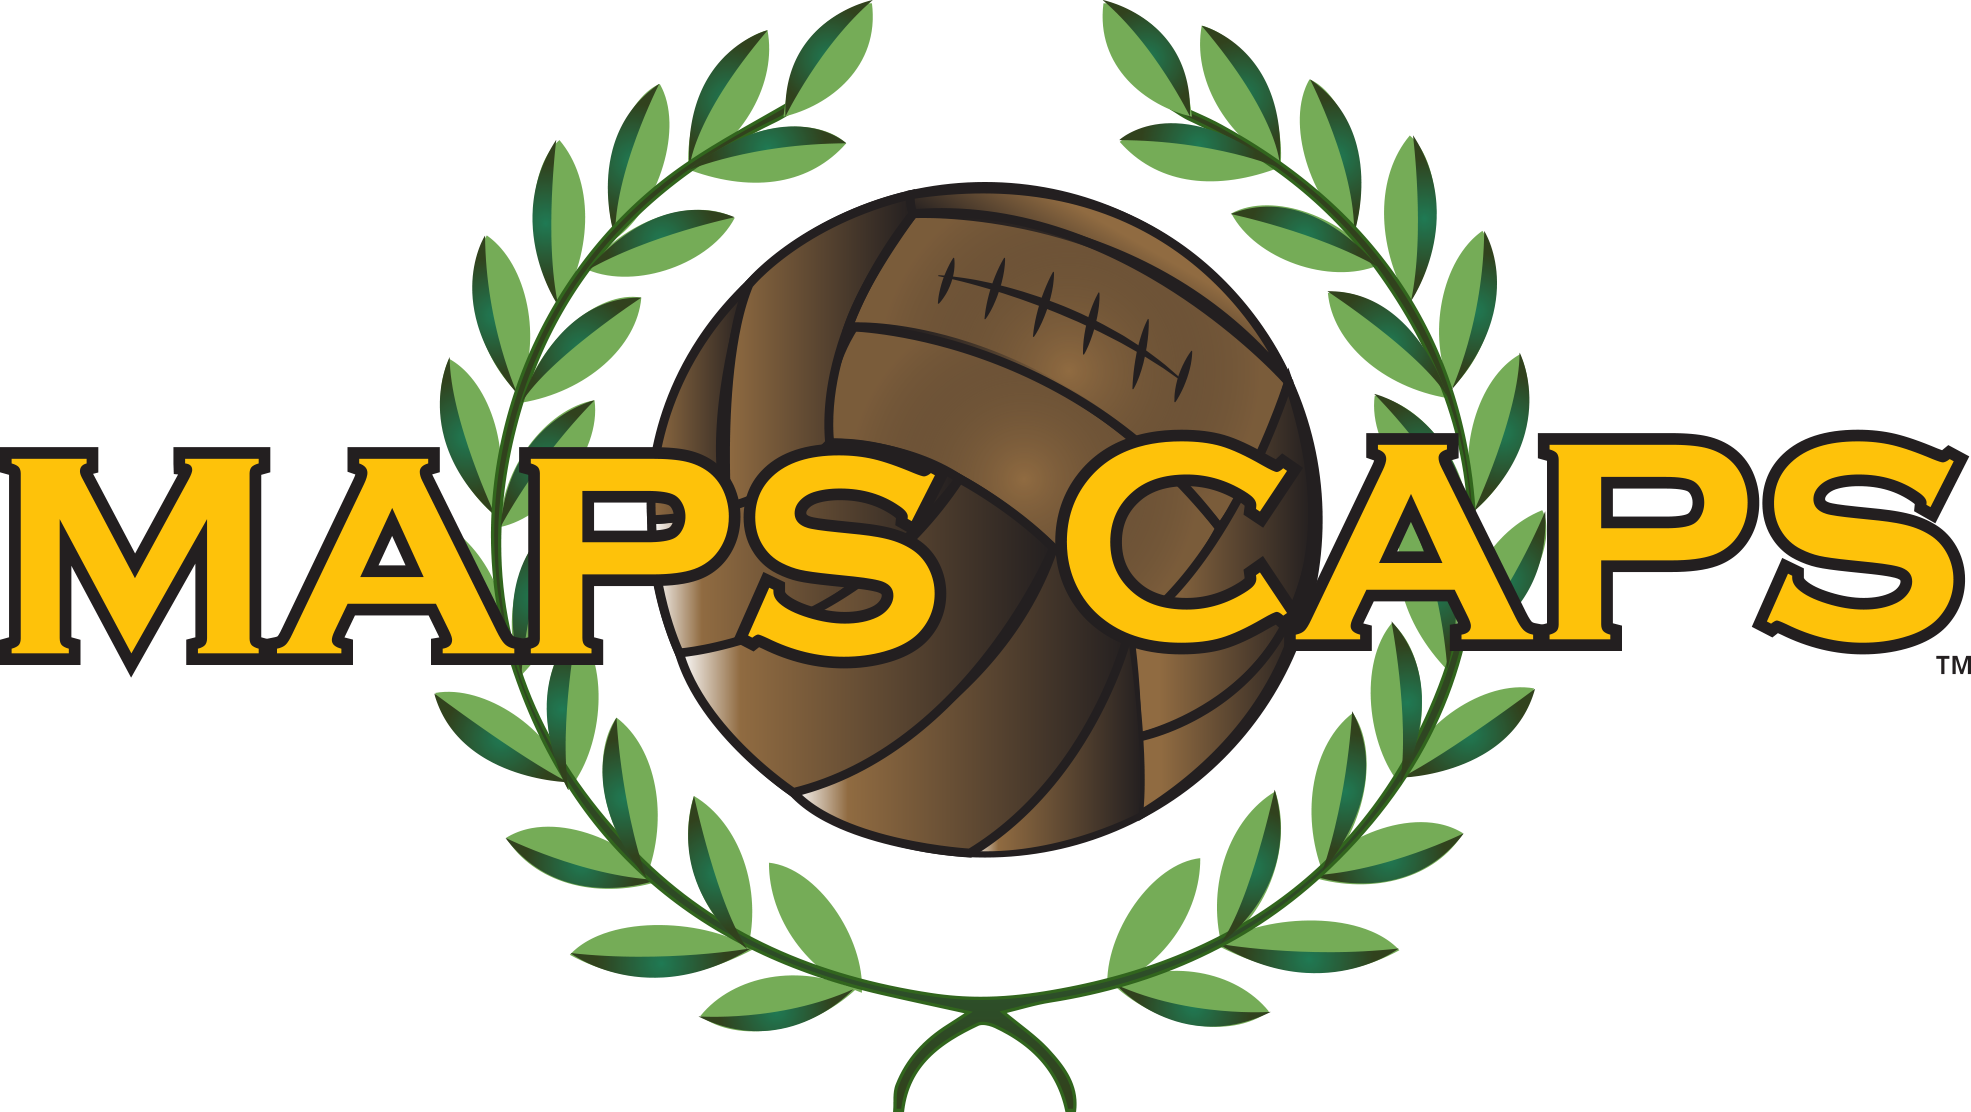 MAPS CAPS - Maps soccer